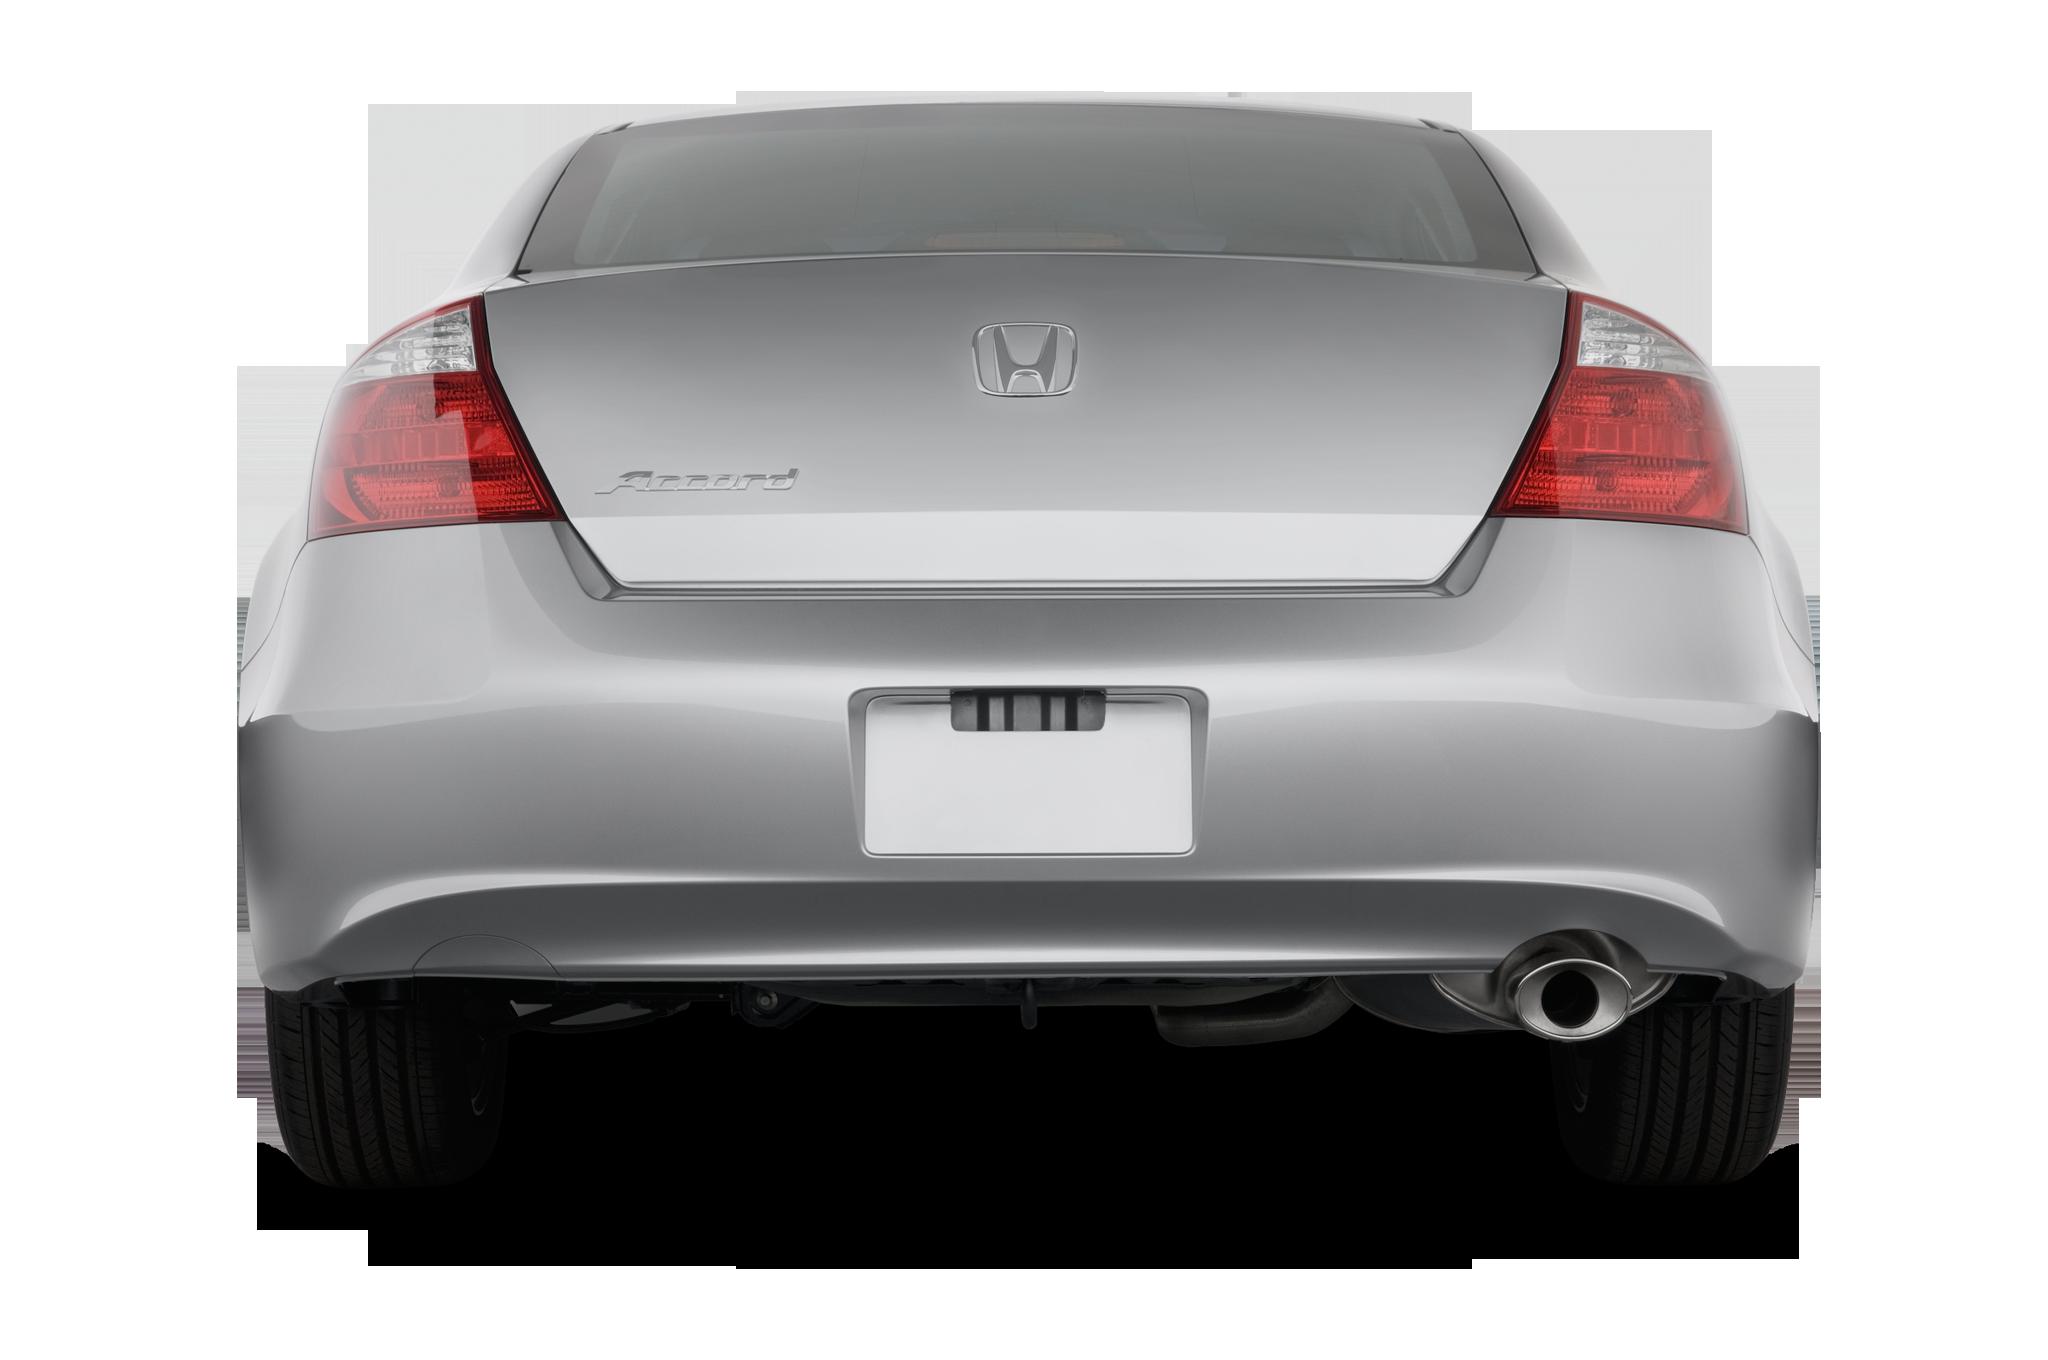 2010 Honda Accord Coupe EX L Honda Midsize Coupe Review